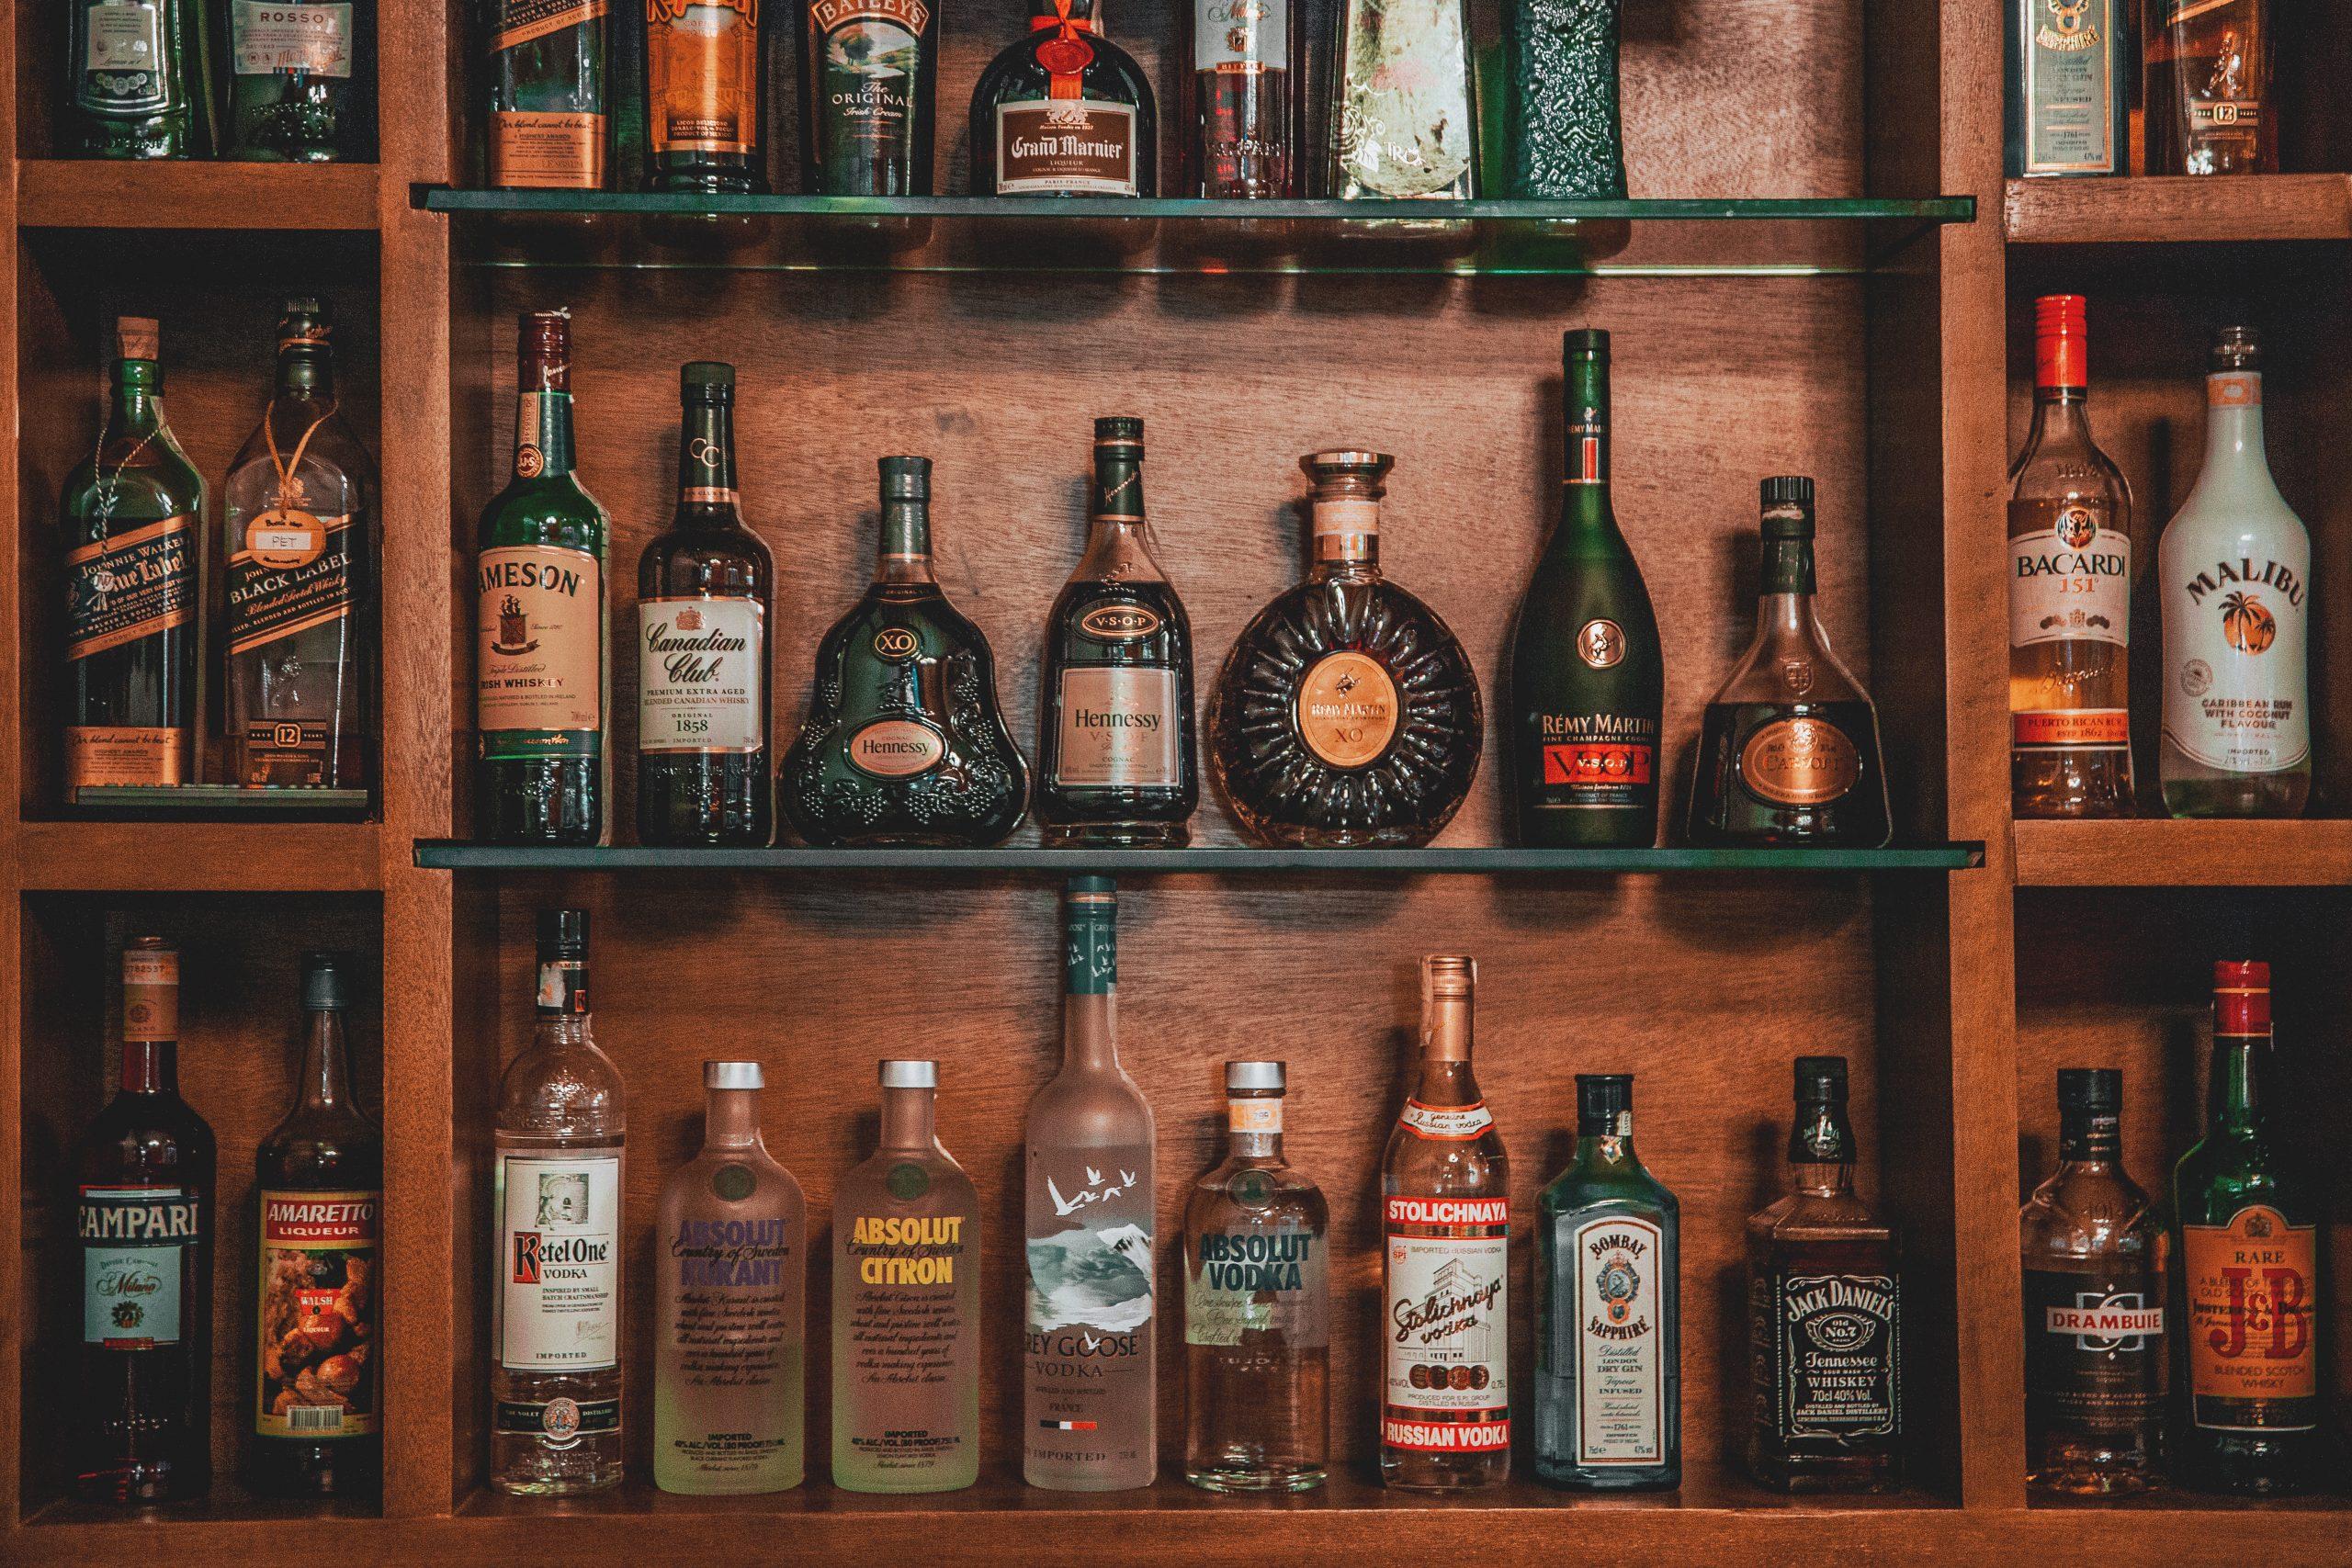 A photo of liquor on shelves.